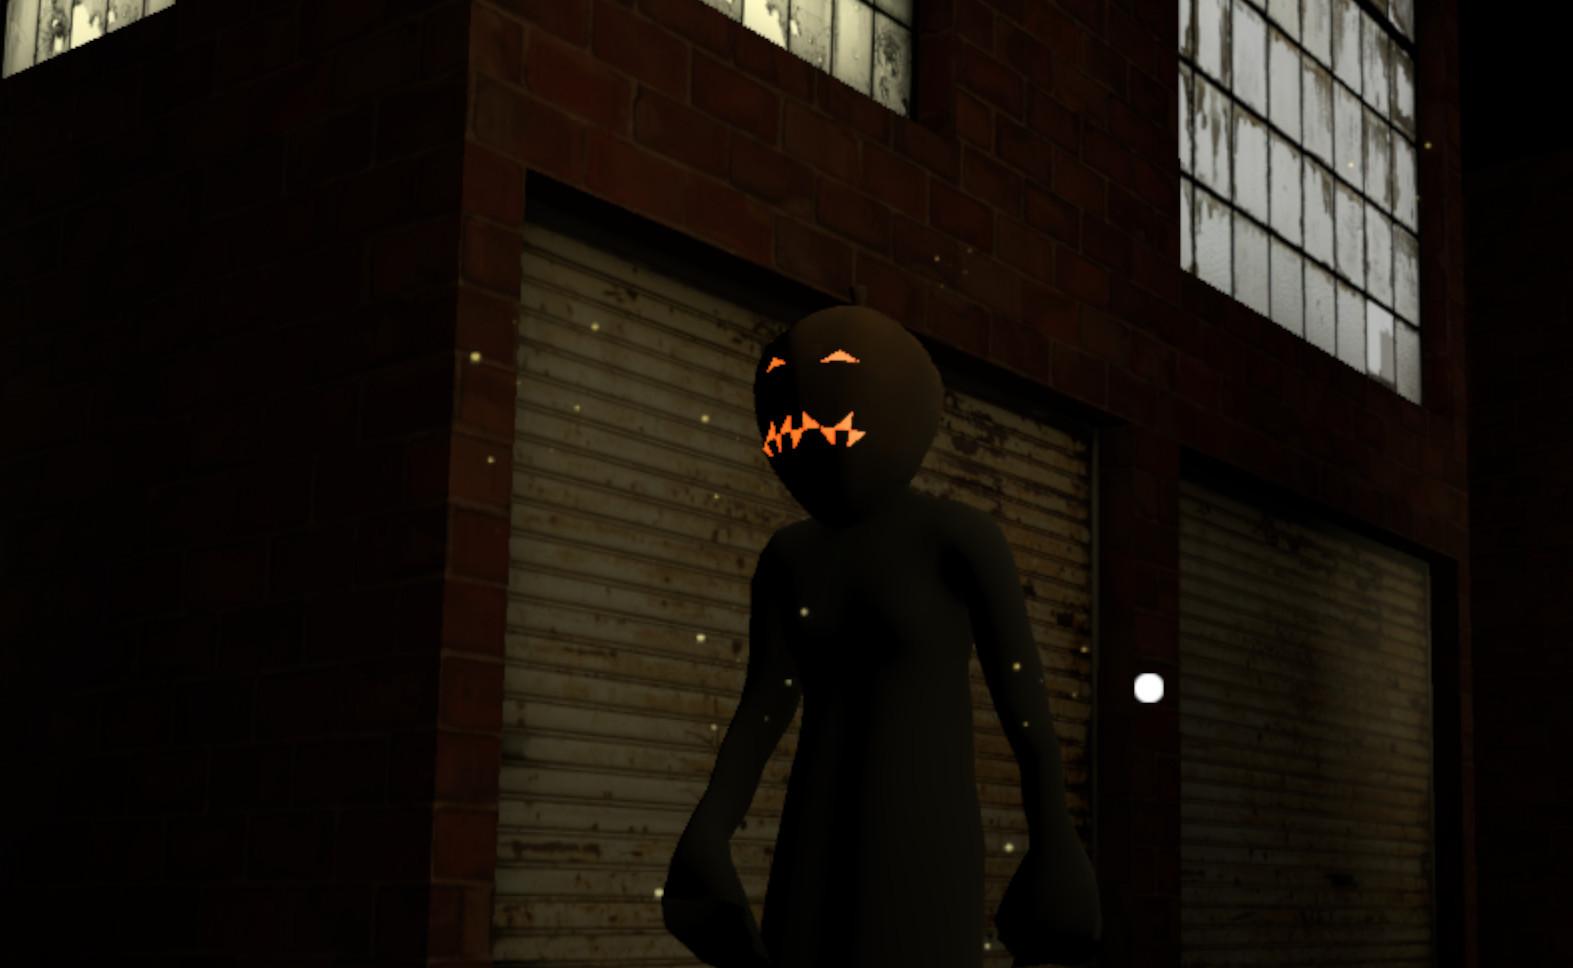 Jack-O-Lantern Covers of Darkness PC Key Fiyatları